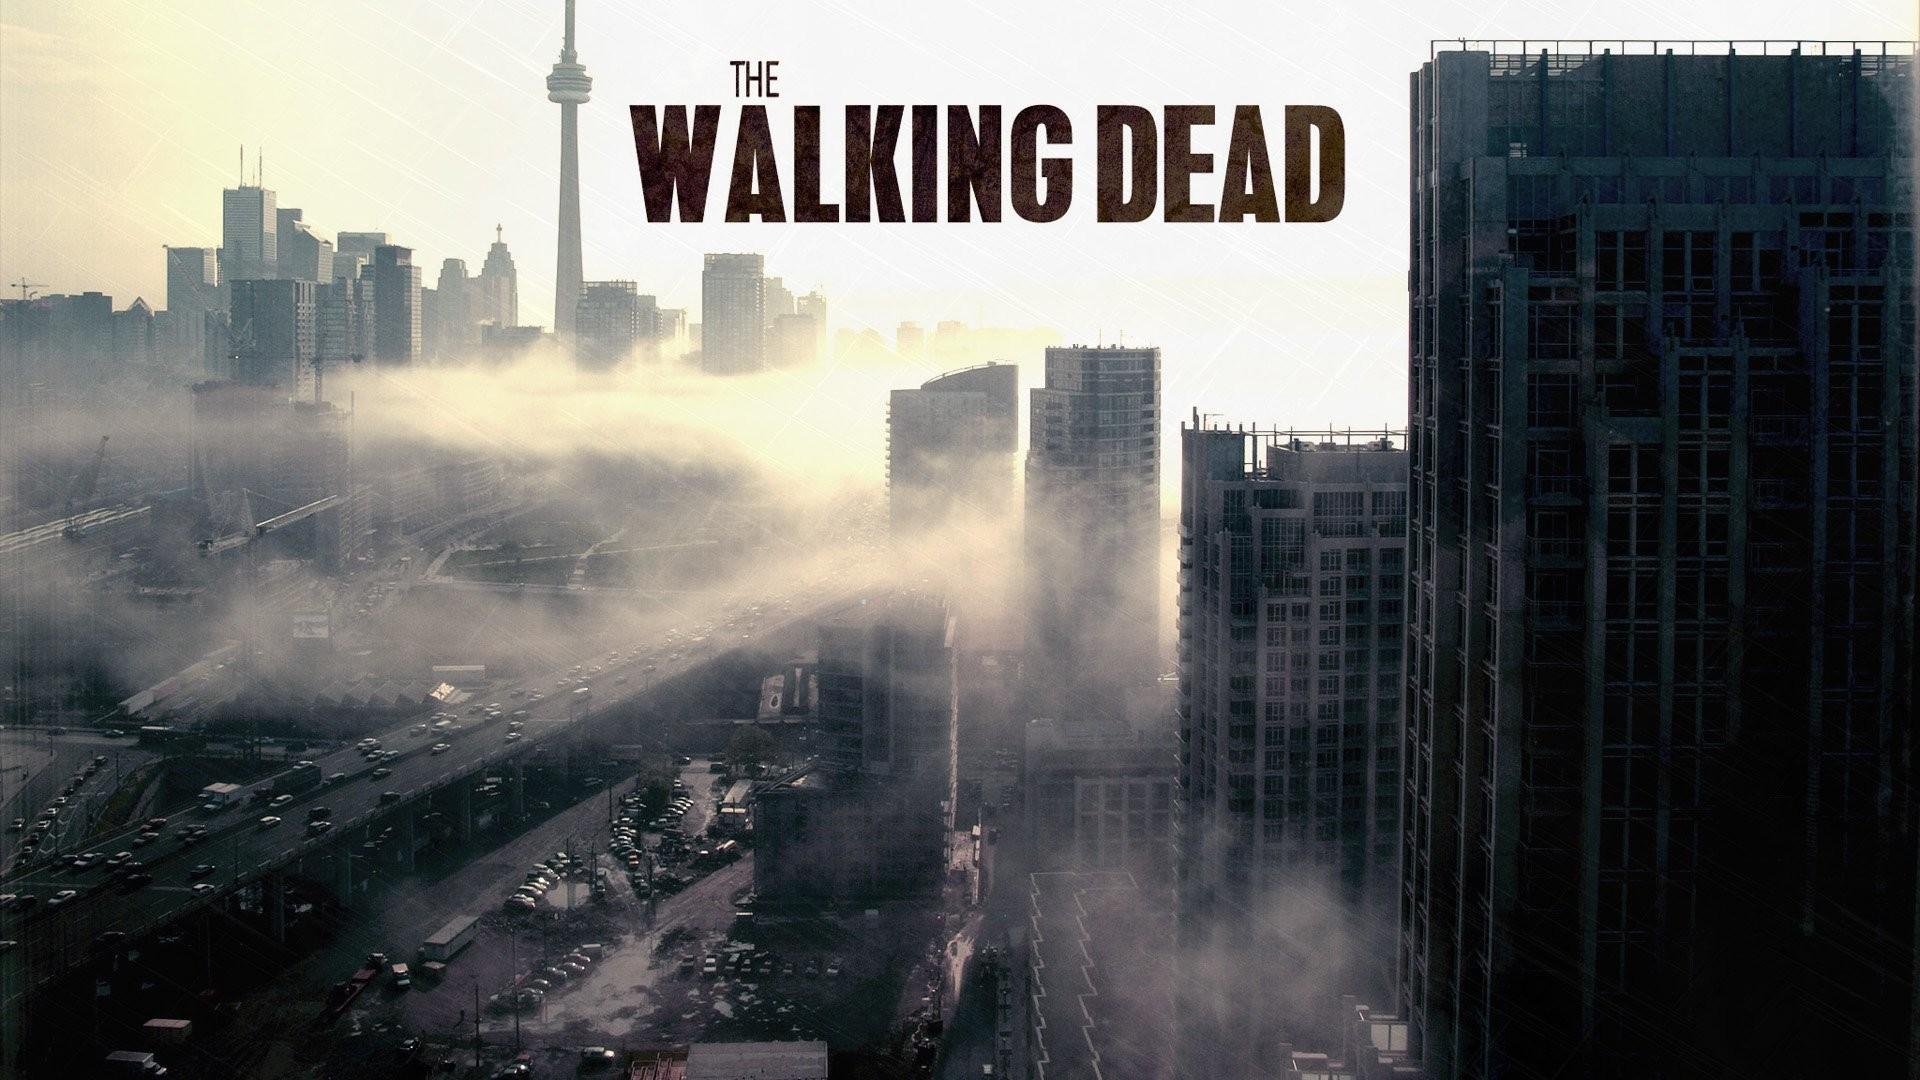 The Walking Dead Wallpapers Group 1920×1080 The Walking Dead Wallpapers  1920×1080 (